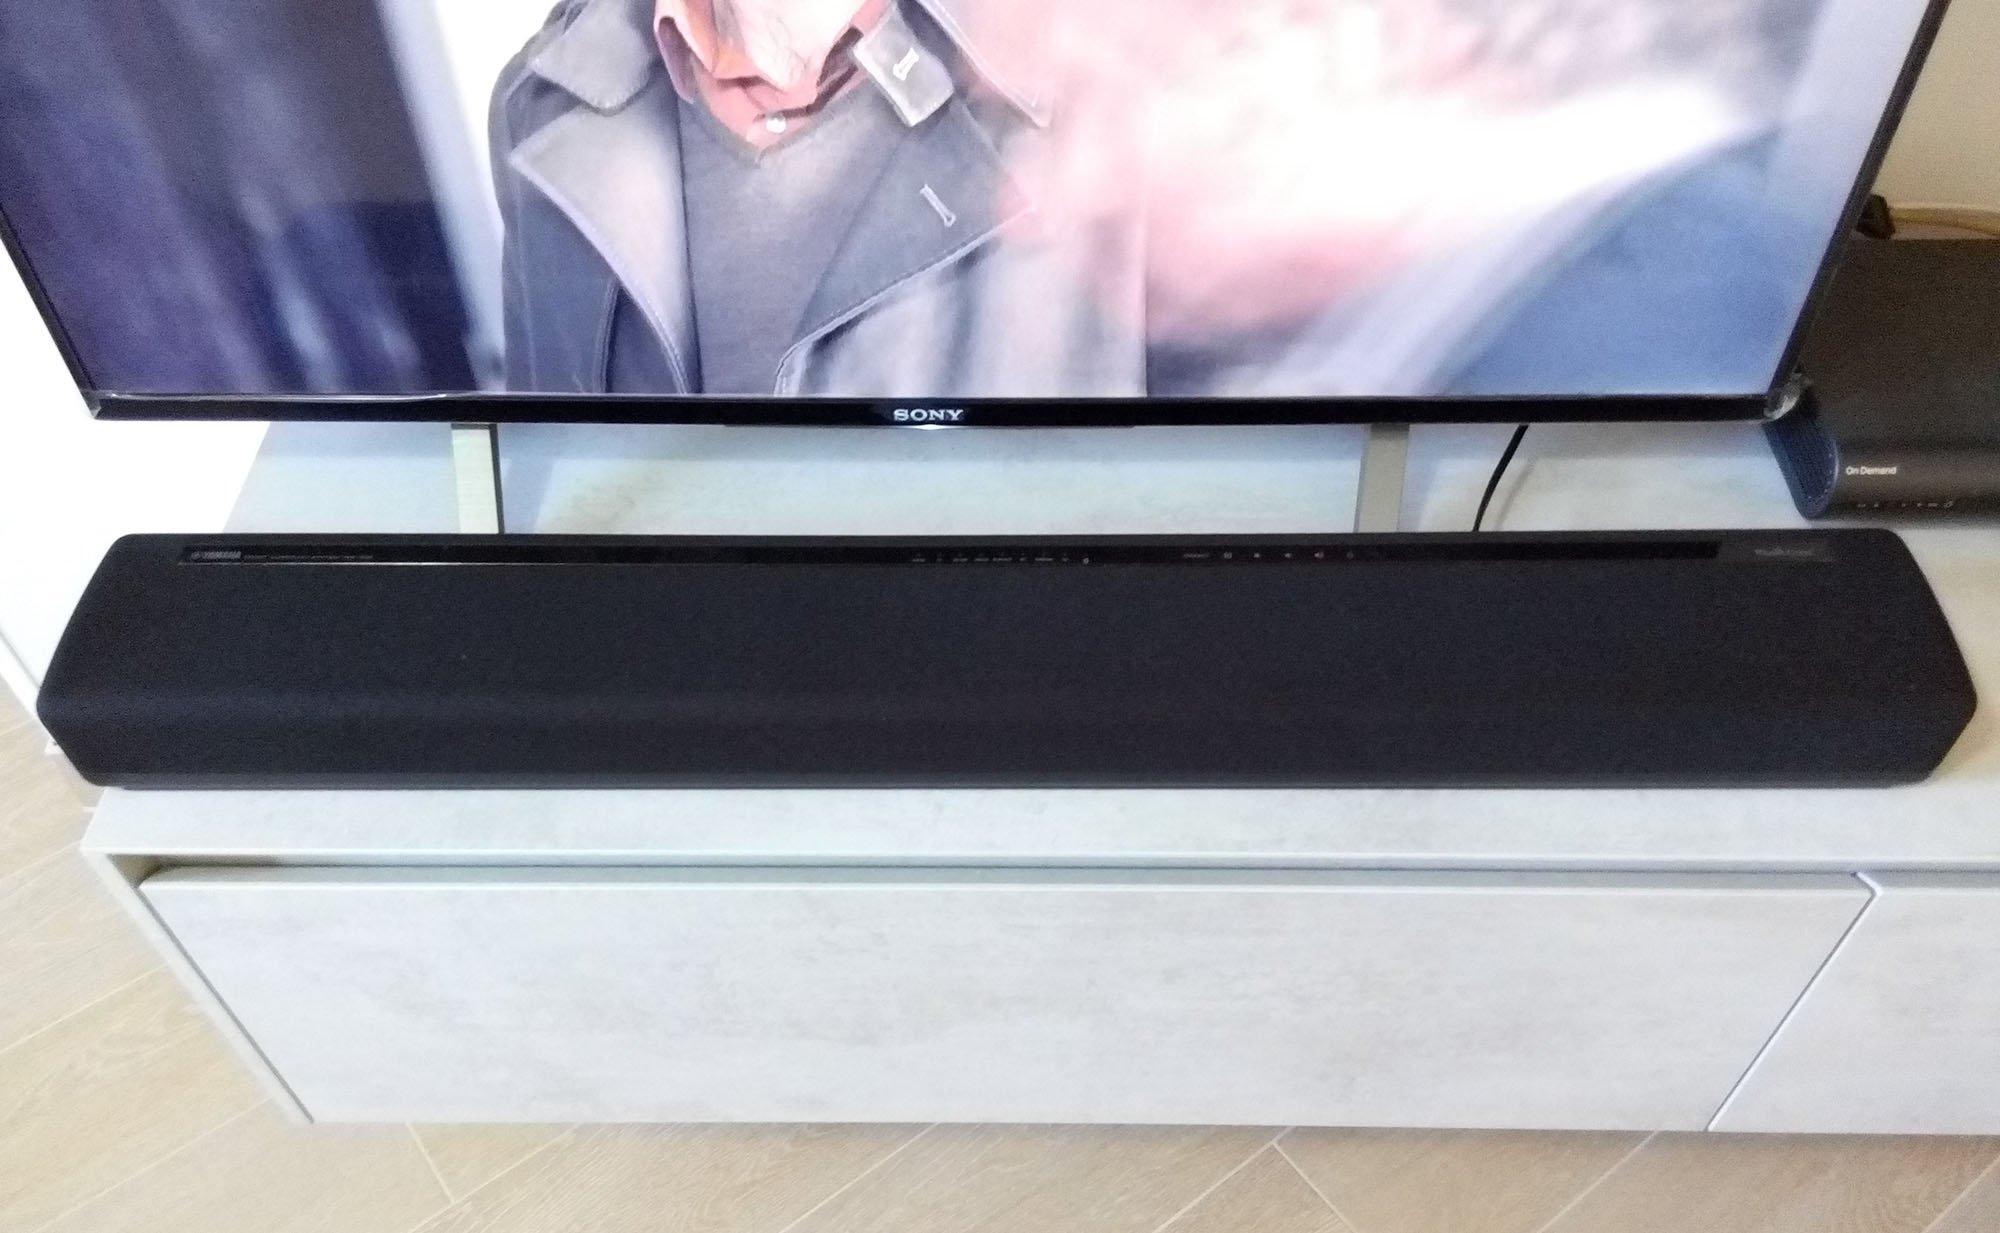 yamaha musiccast yas 306 recensione una soundbar elegante. Black Bedroom Furniture Sets. Home Design Ideas